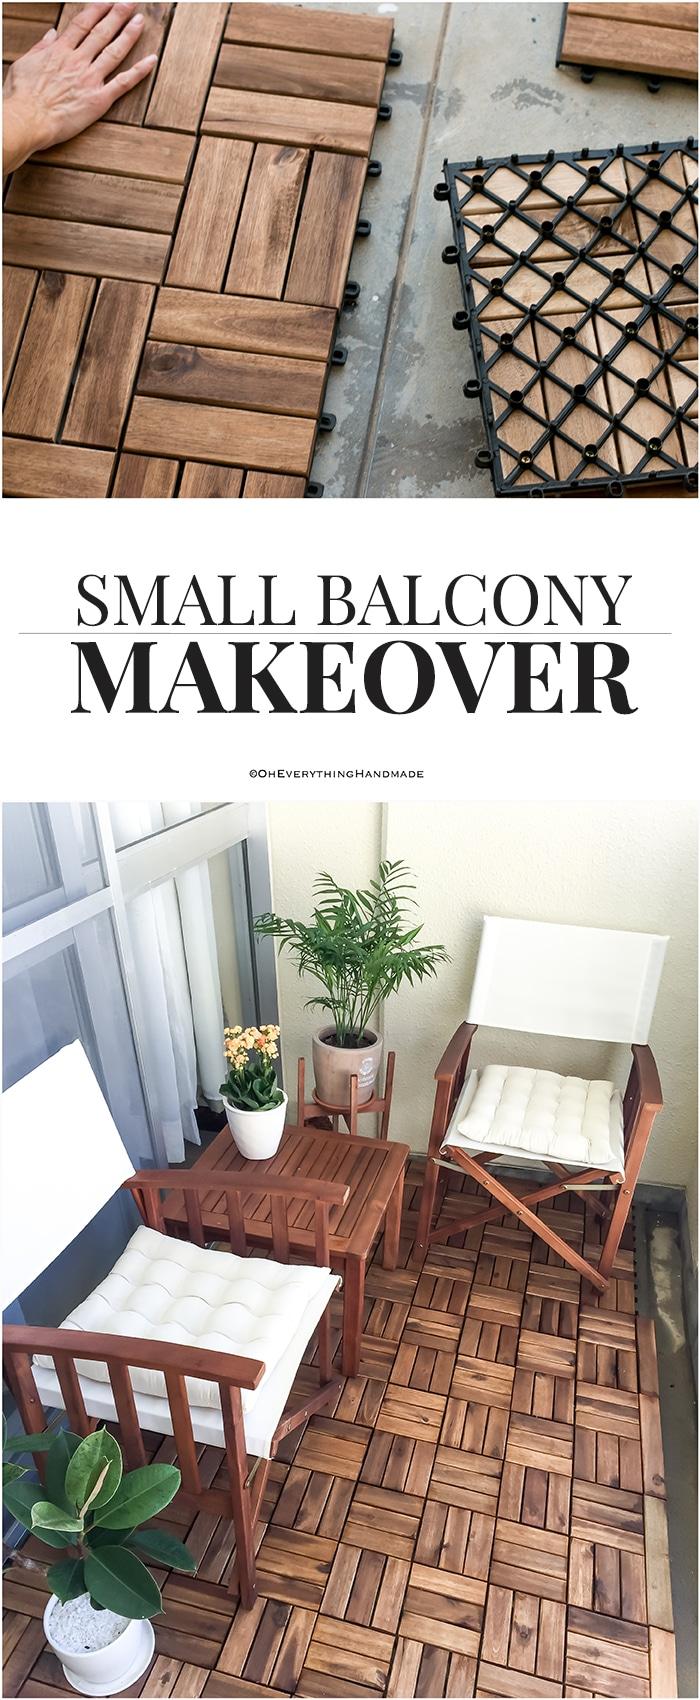 Small Balcony Makeover » Oh Everything Handmade